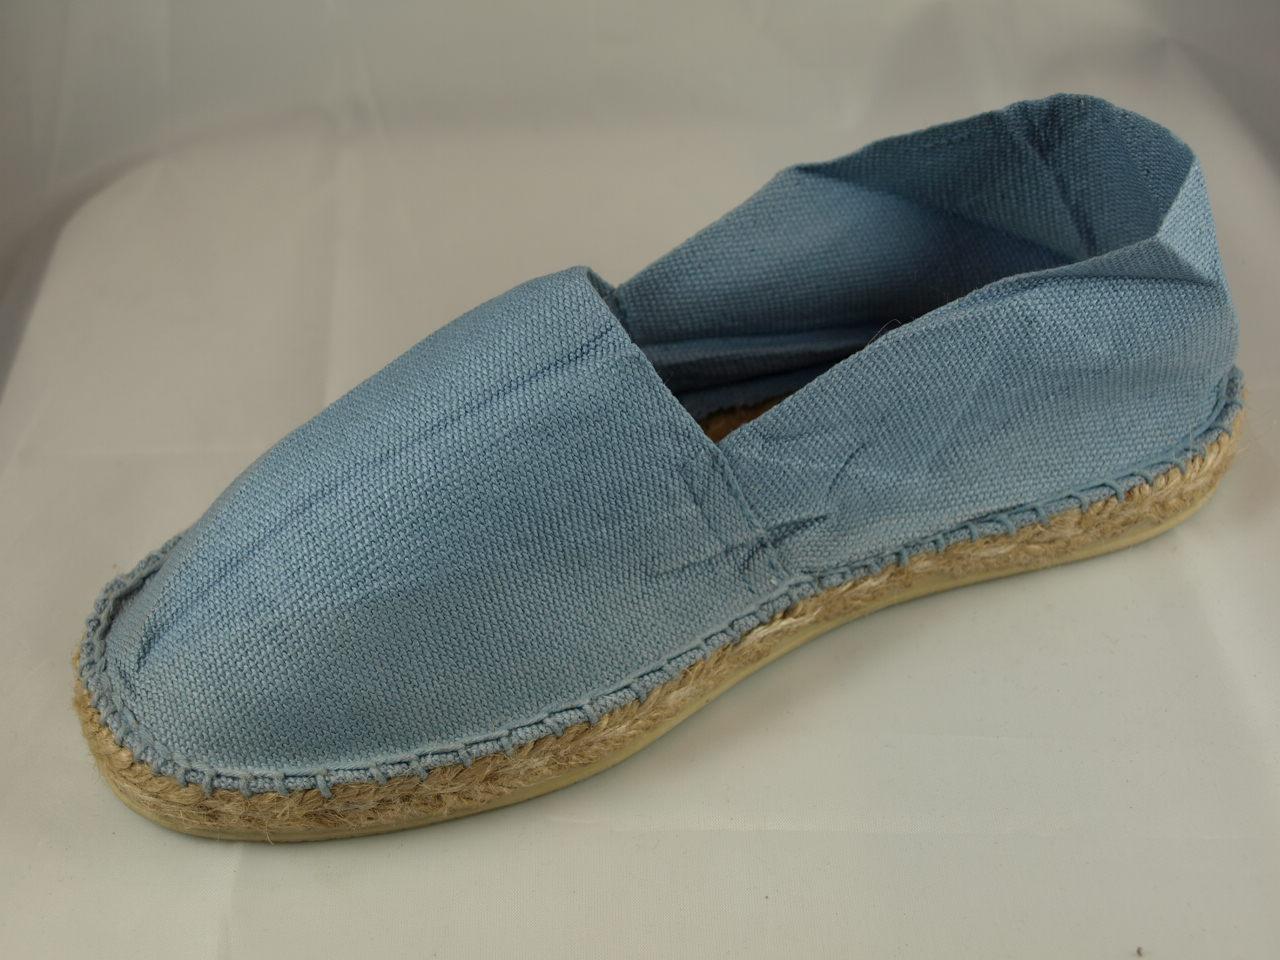 Saisonnier Gibert Saisonnier Chaussures Uzès Chaussures 0xcUqwH